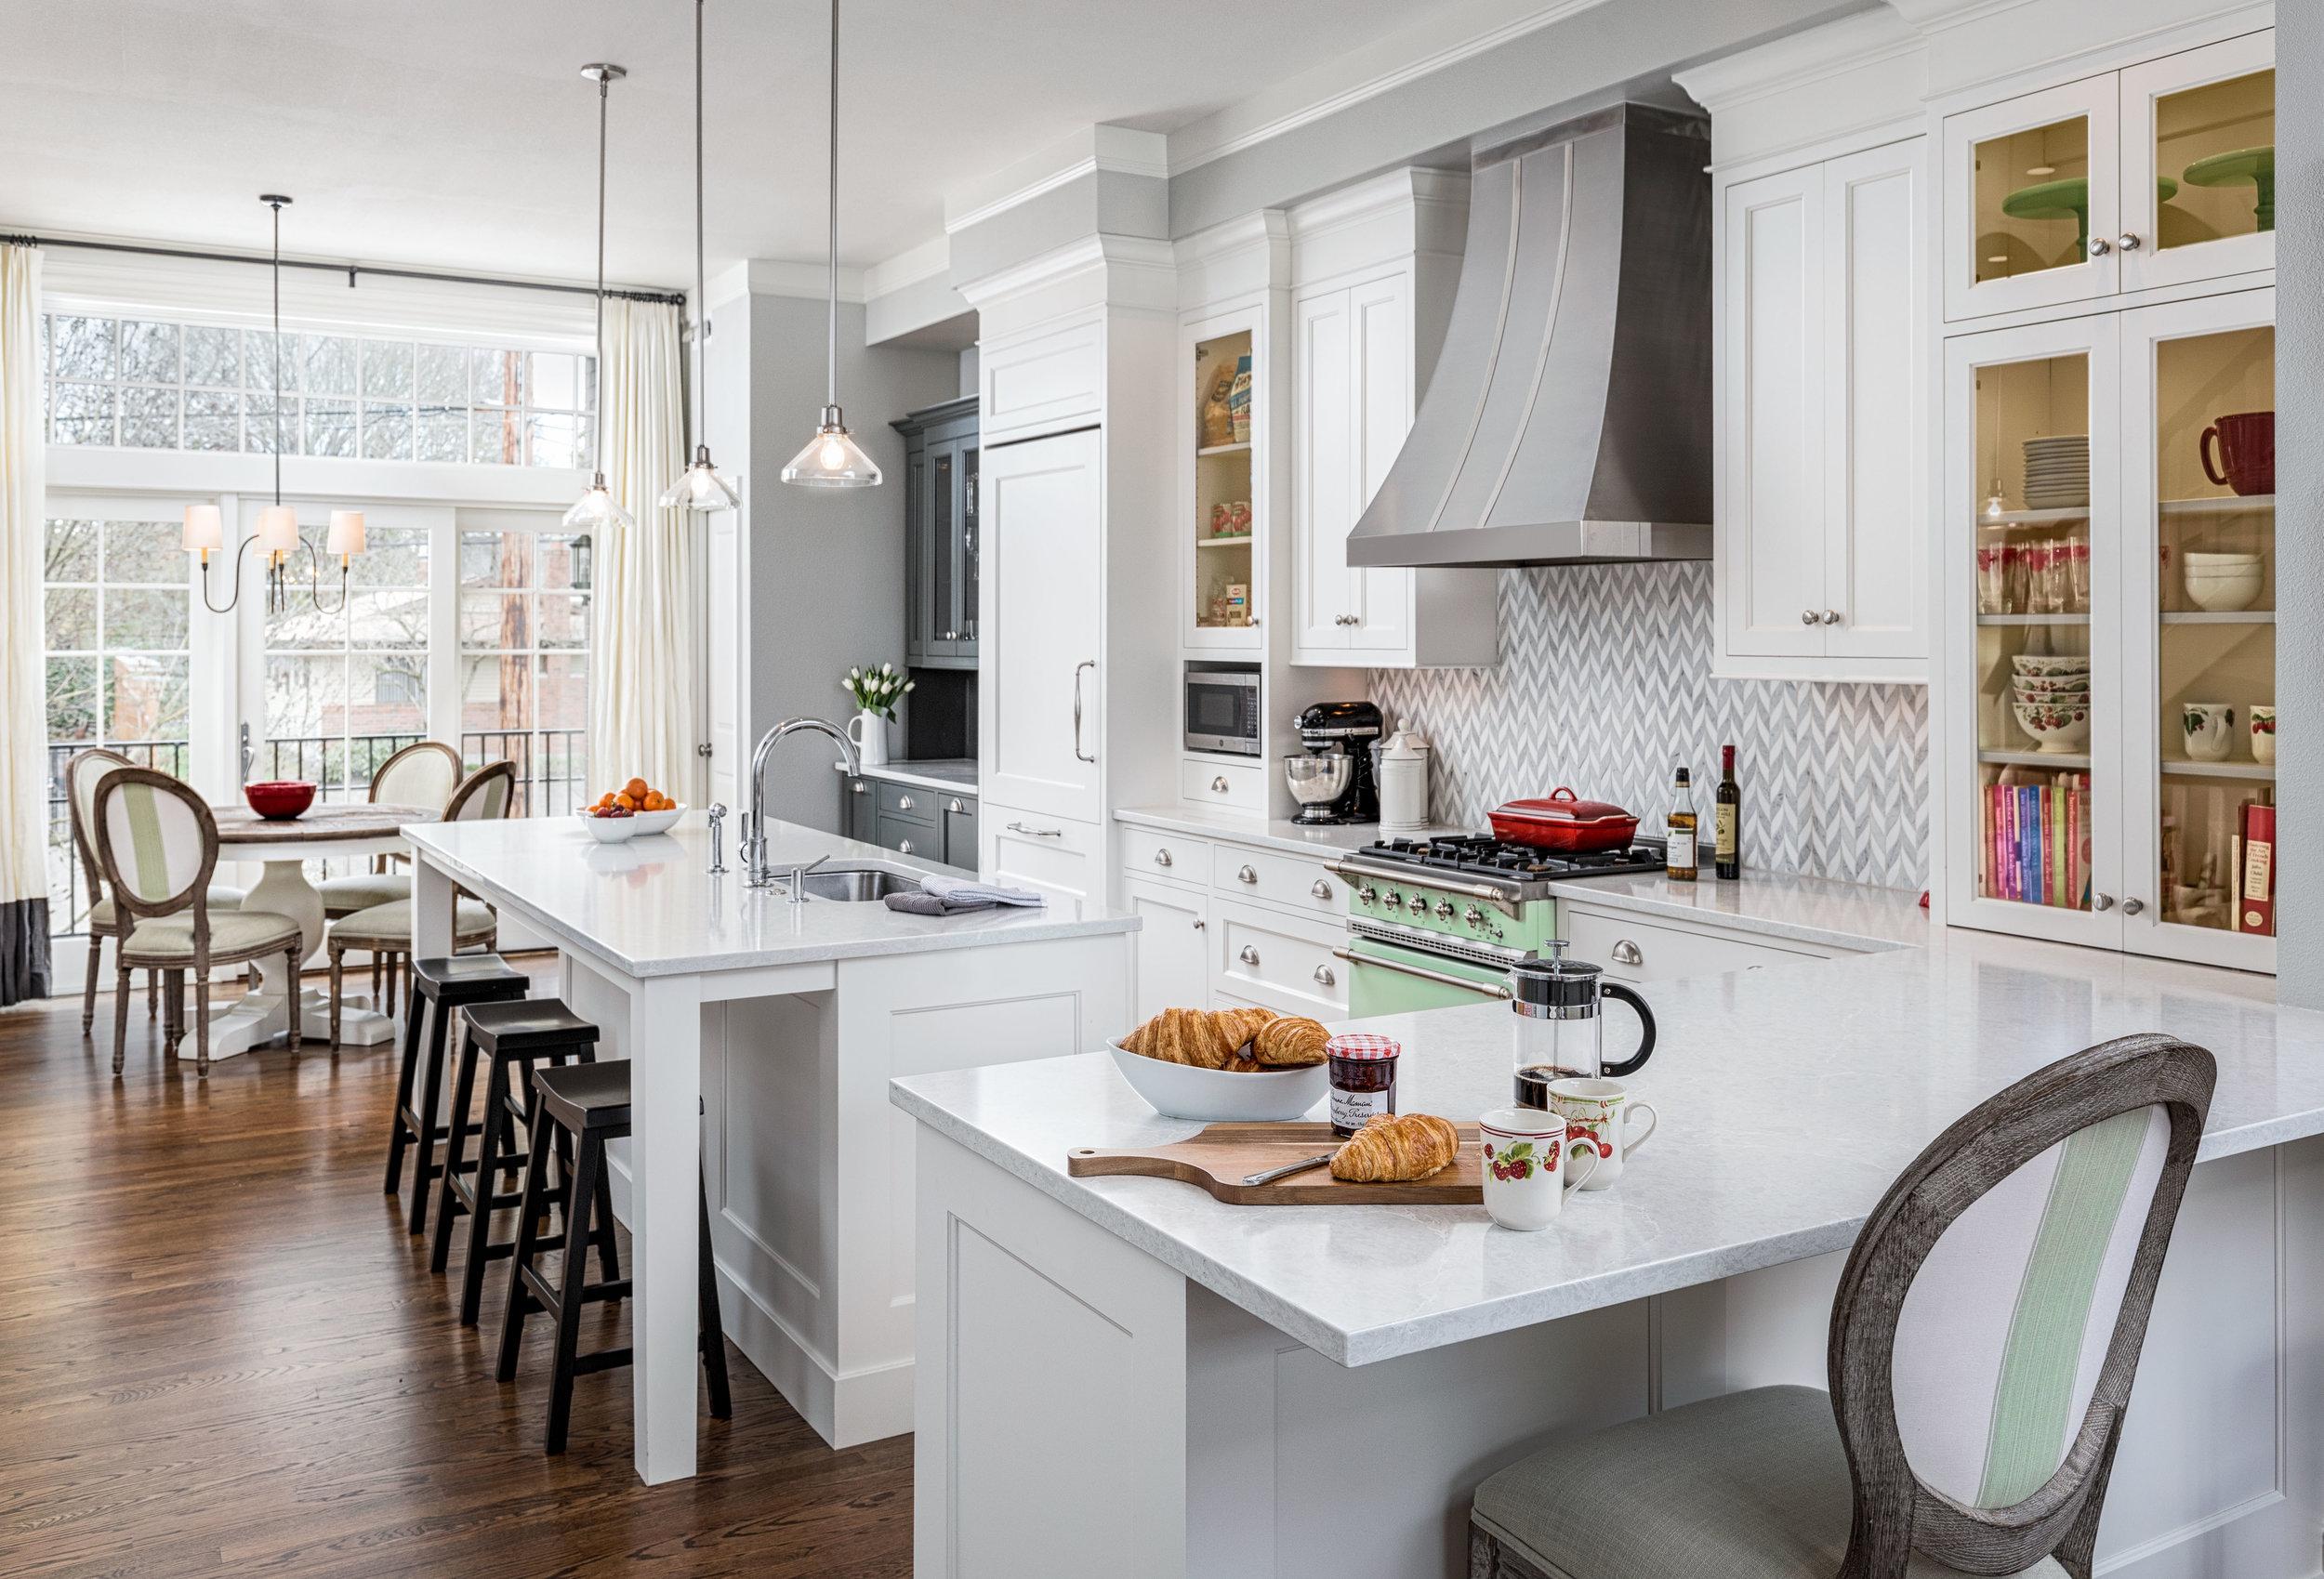 SE Portland Kitchen Remodel by Jenni Leasia Design